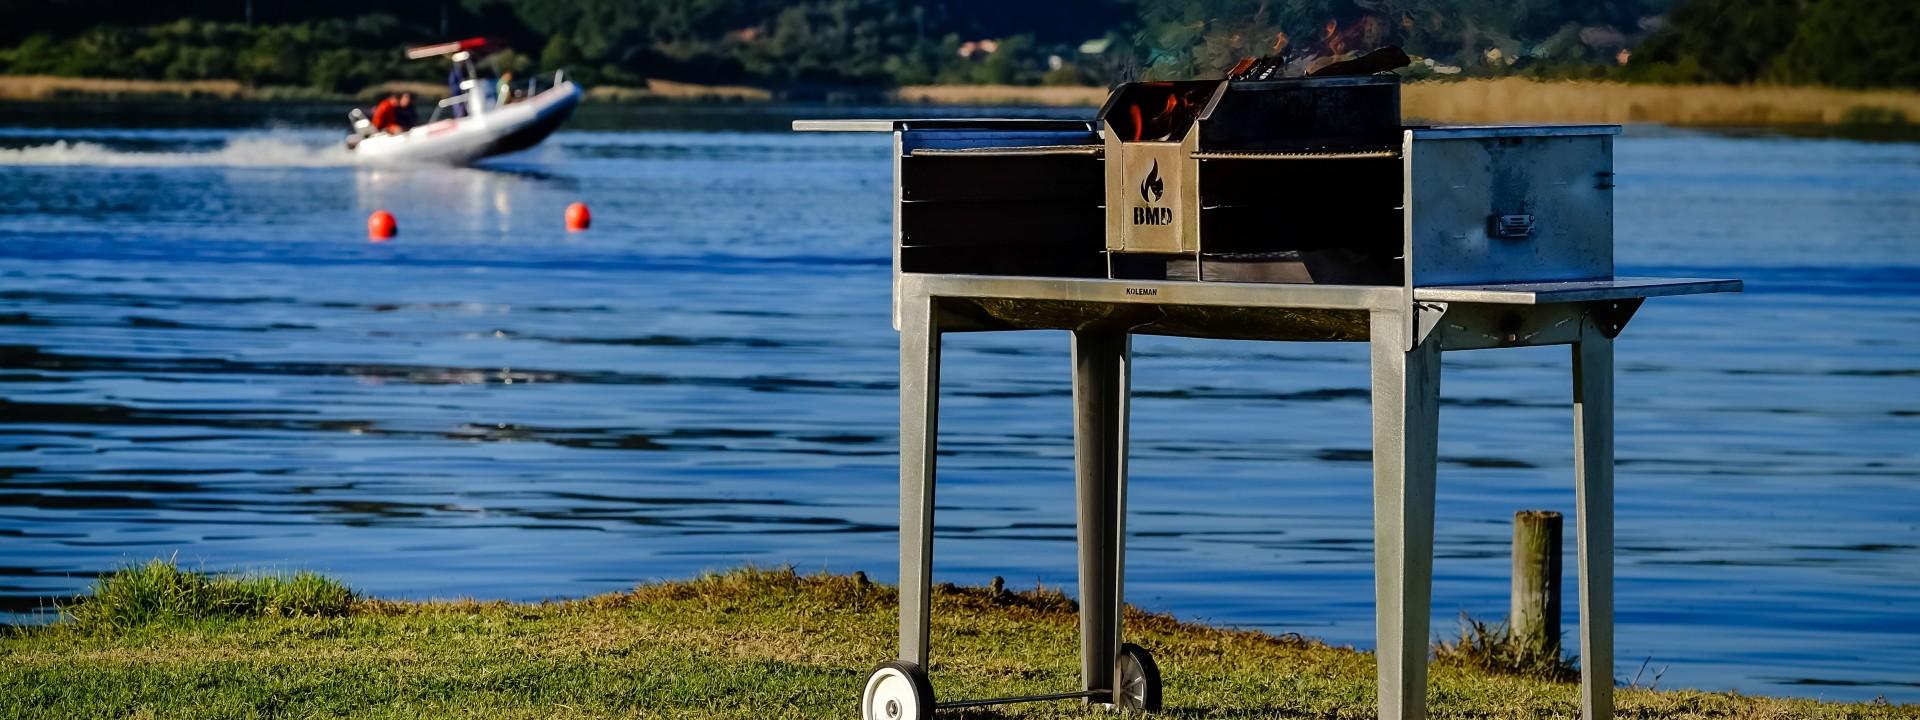 Stainless steel outdoor braai